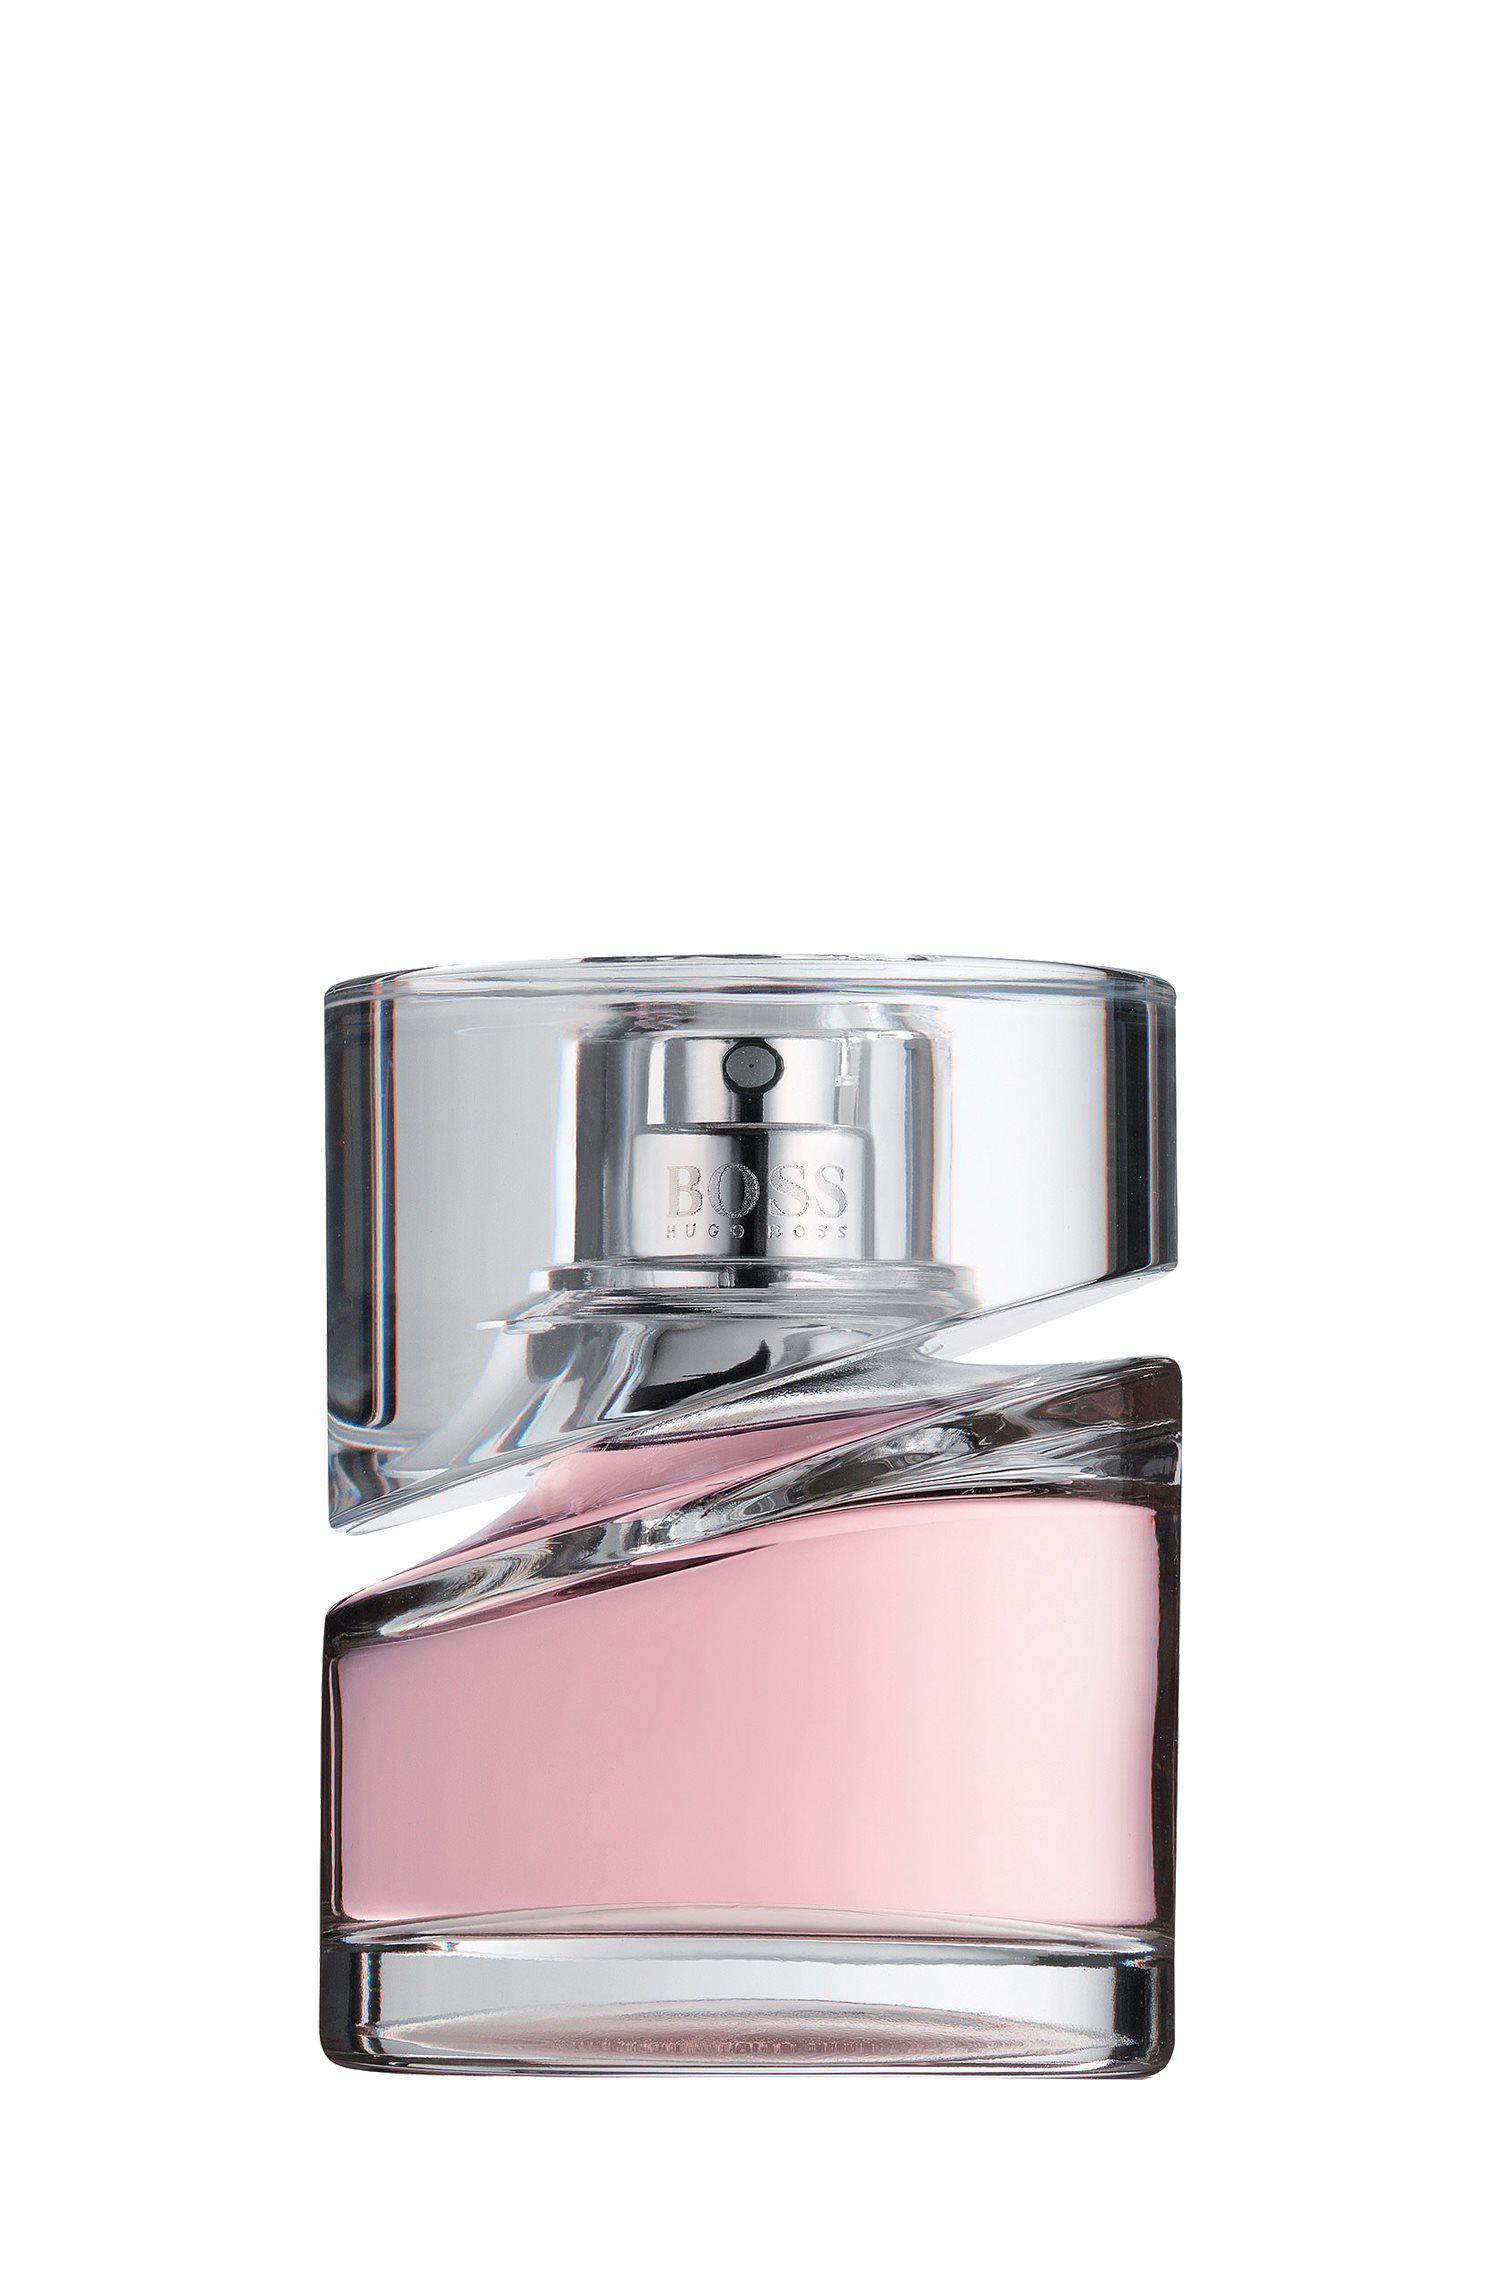 Femme by BOSS eau de parfum 50ml , Assorted-Pre-Pack